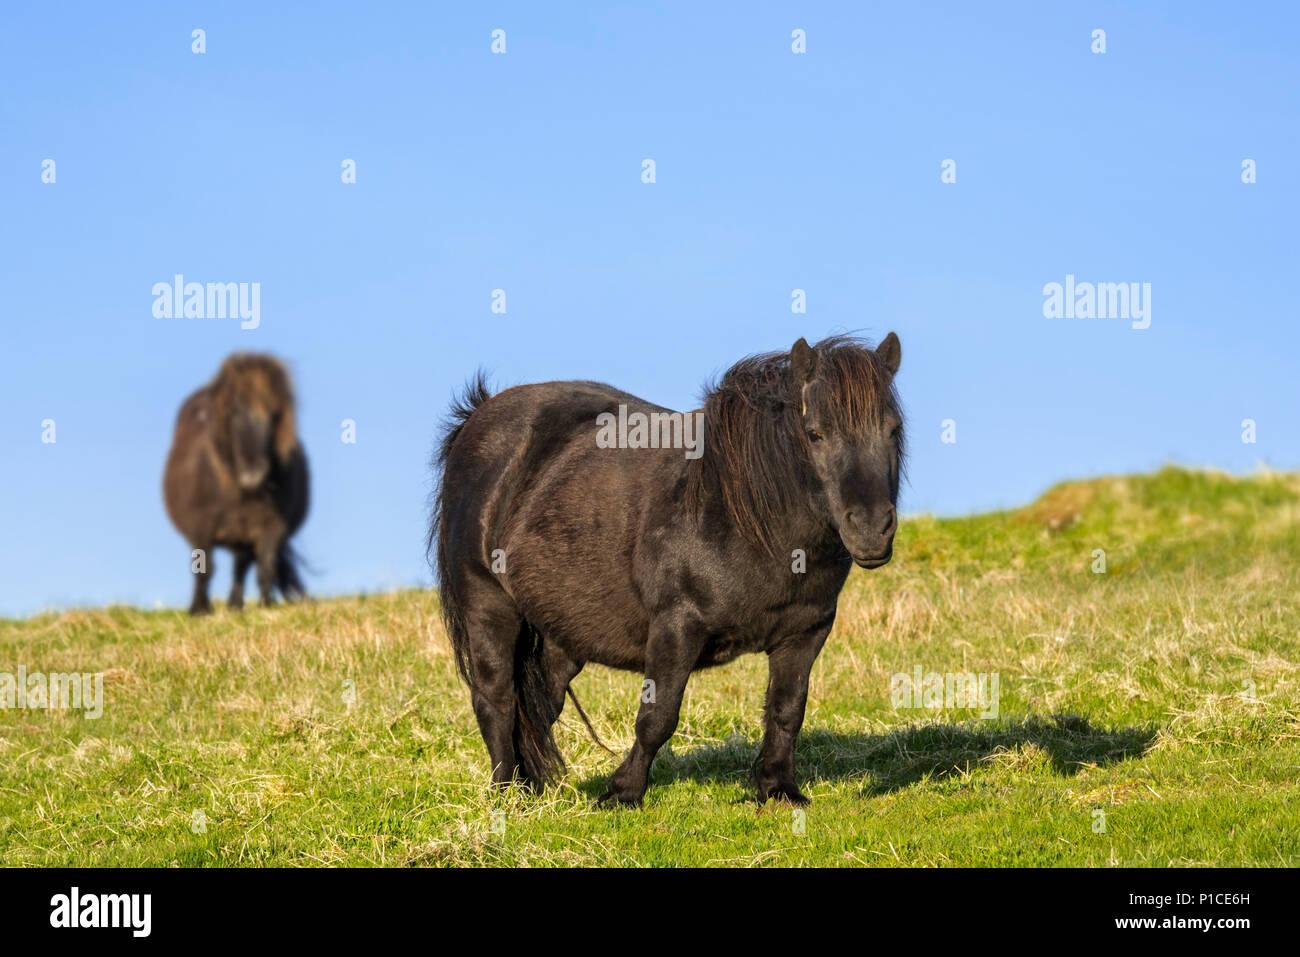 Two black Shetland ponies in grassland on the Shetland Islands, Scotland, UK - Stock Image